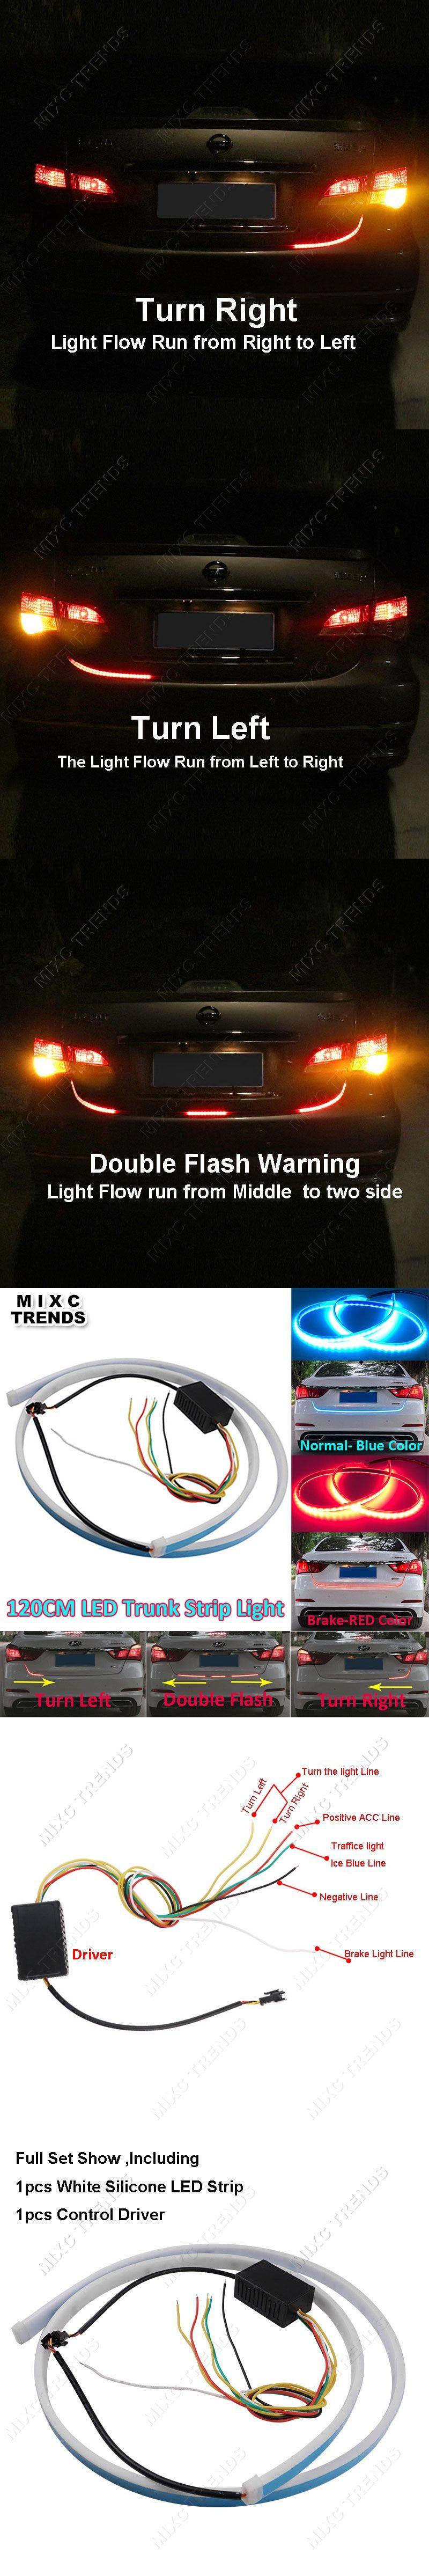 120cm car styling led strip lighting rear trunk tail light red 120cm car styling led strip lighting rear trunk tail light red dynamic streamer brake turn signal aloadofball Images